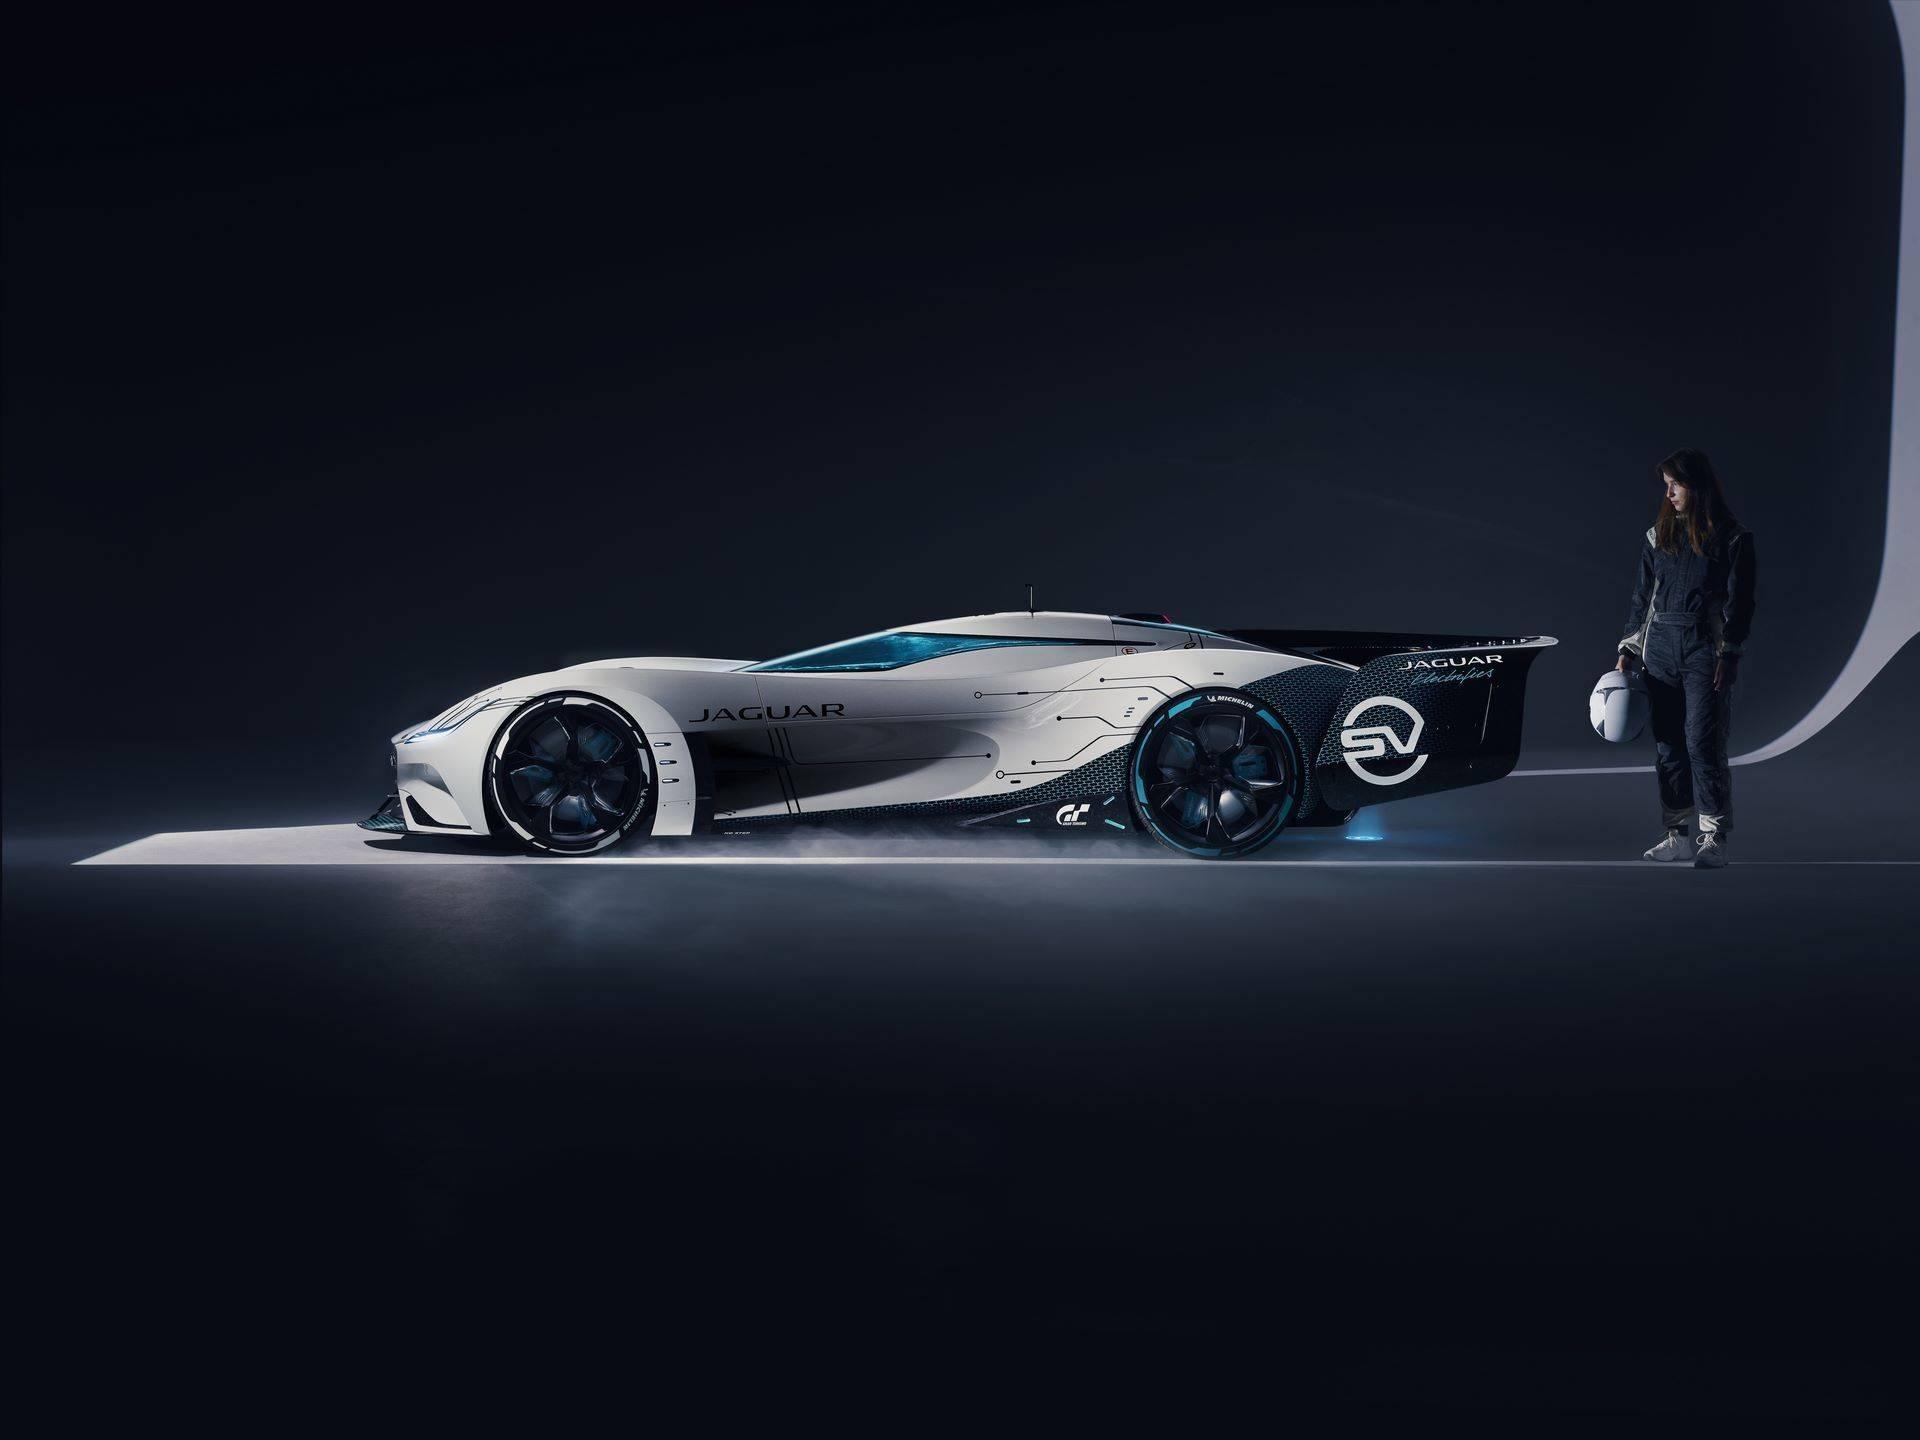 Jaguar-Vision-Gran-Turismo-SV-38